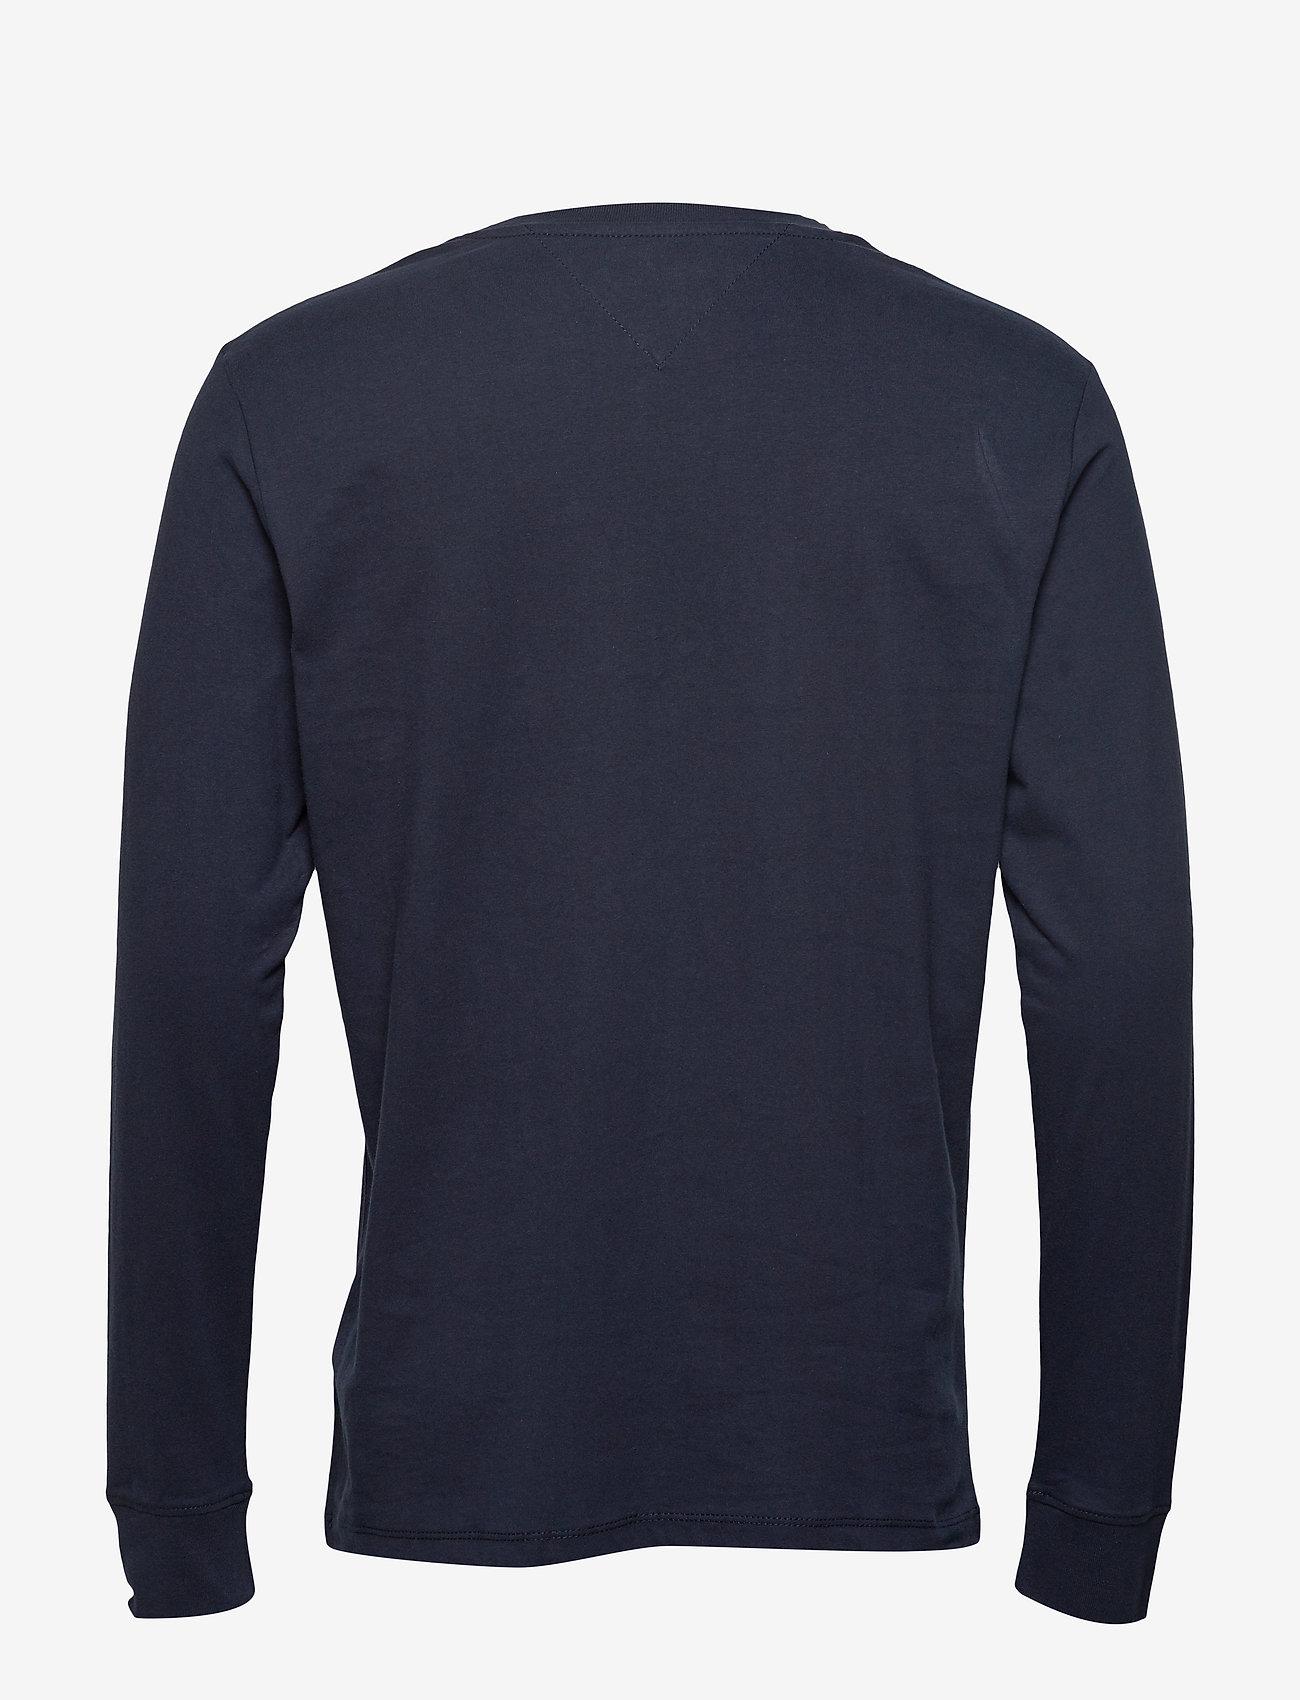 Tommy Jeans - TJM CLASSICS LONGSLEEVE TEE - long-sleeved t-shirts - black iris